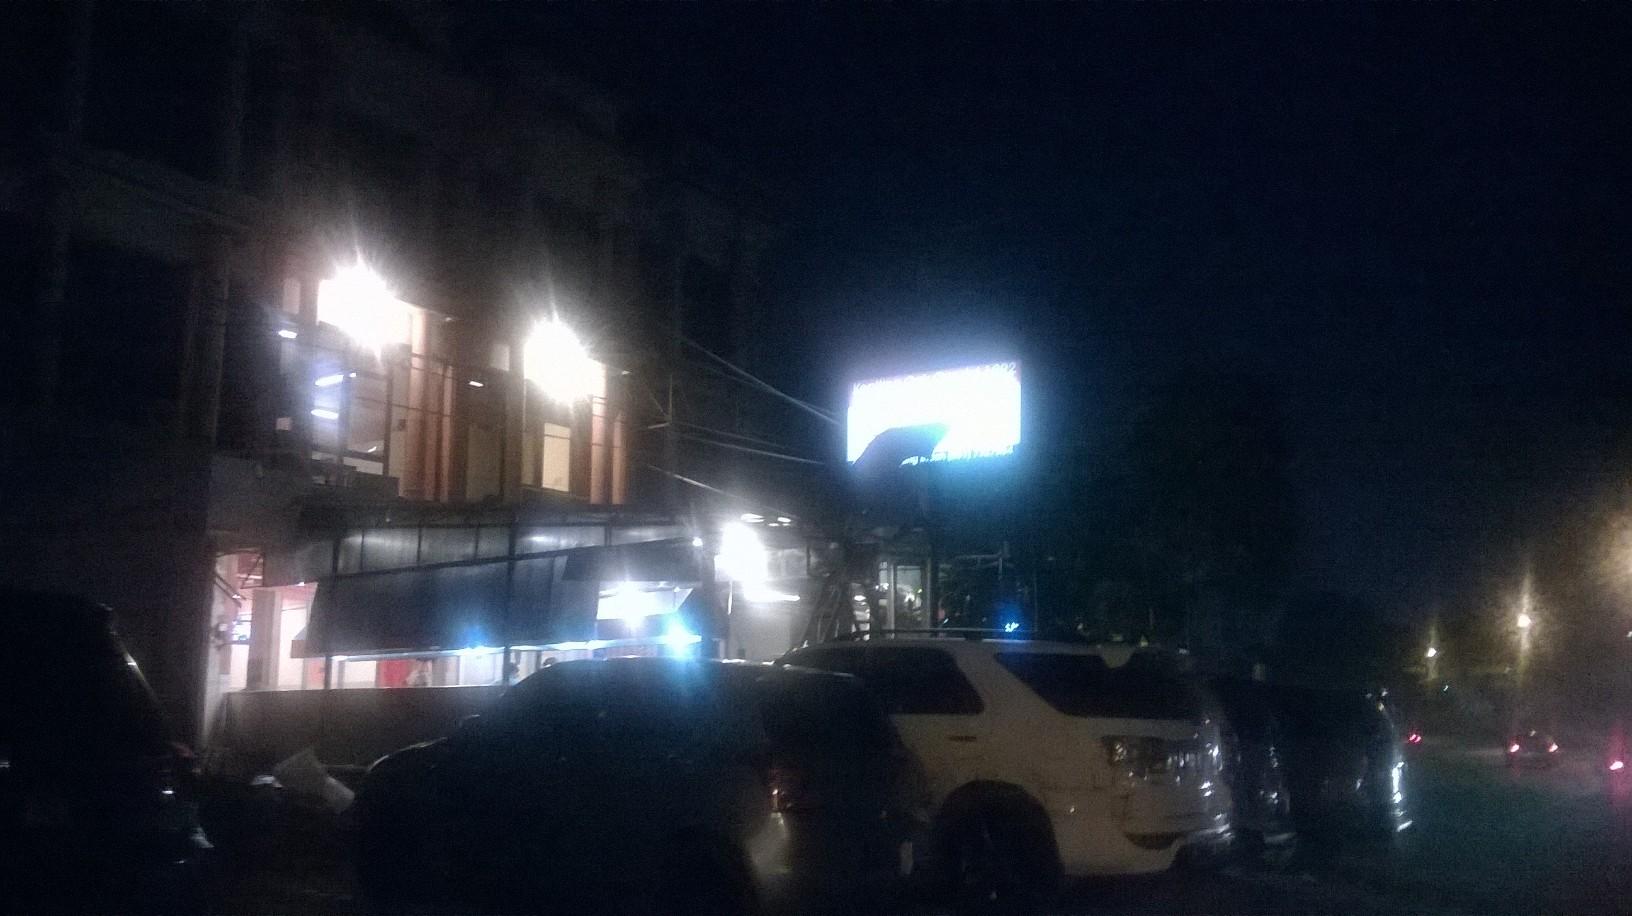 sura-crab-resto-near-hotel-walking-jan16